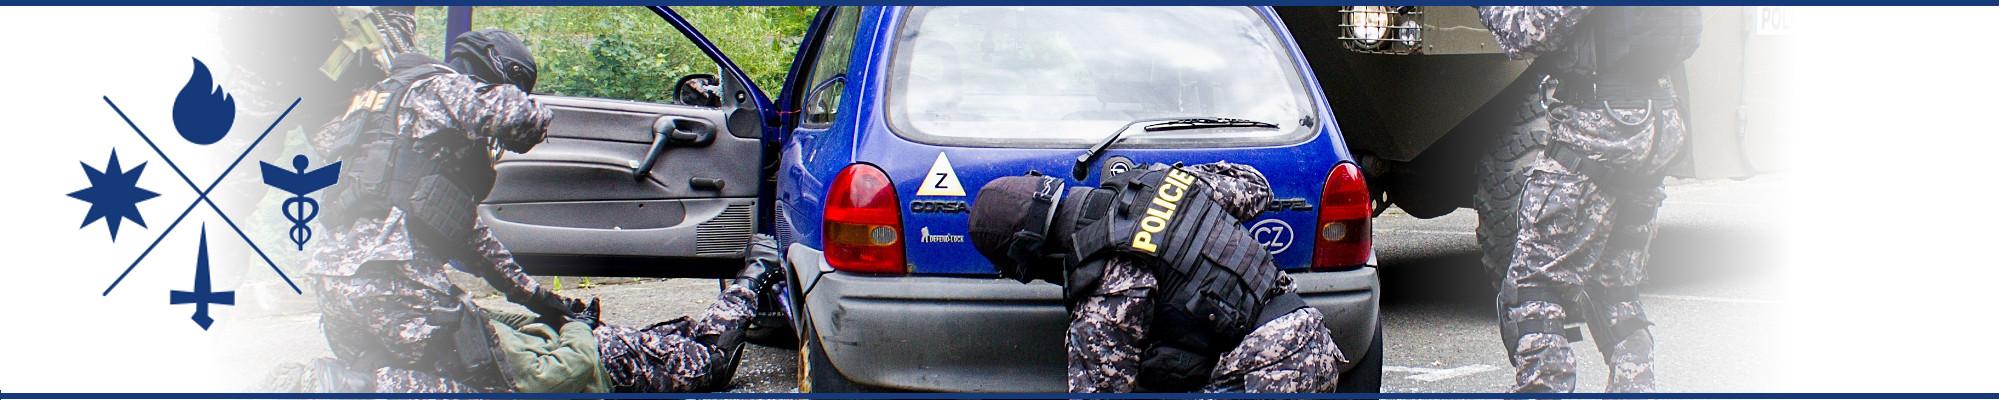 Unie bezpečnostních složek